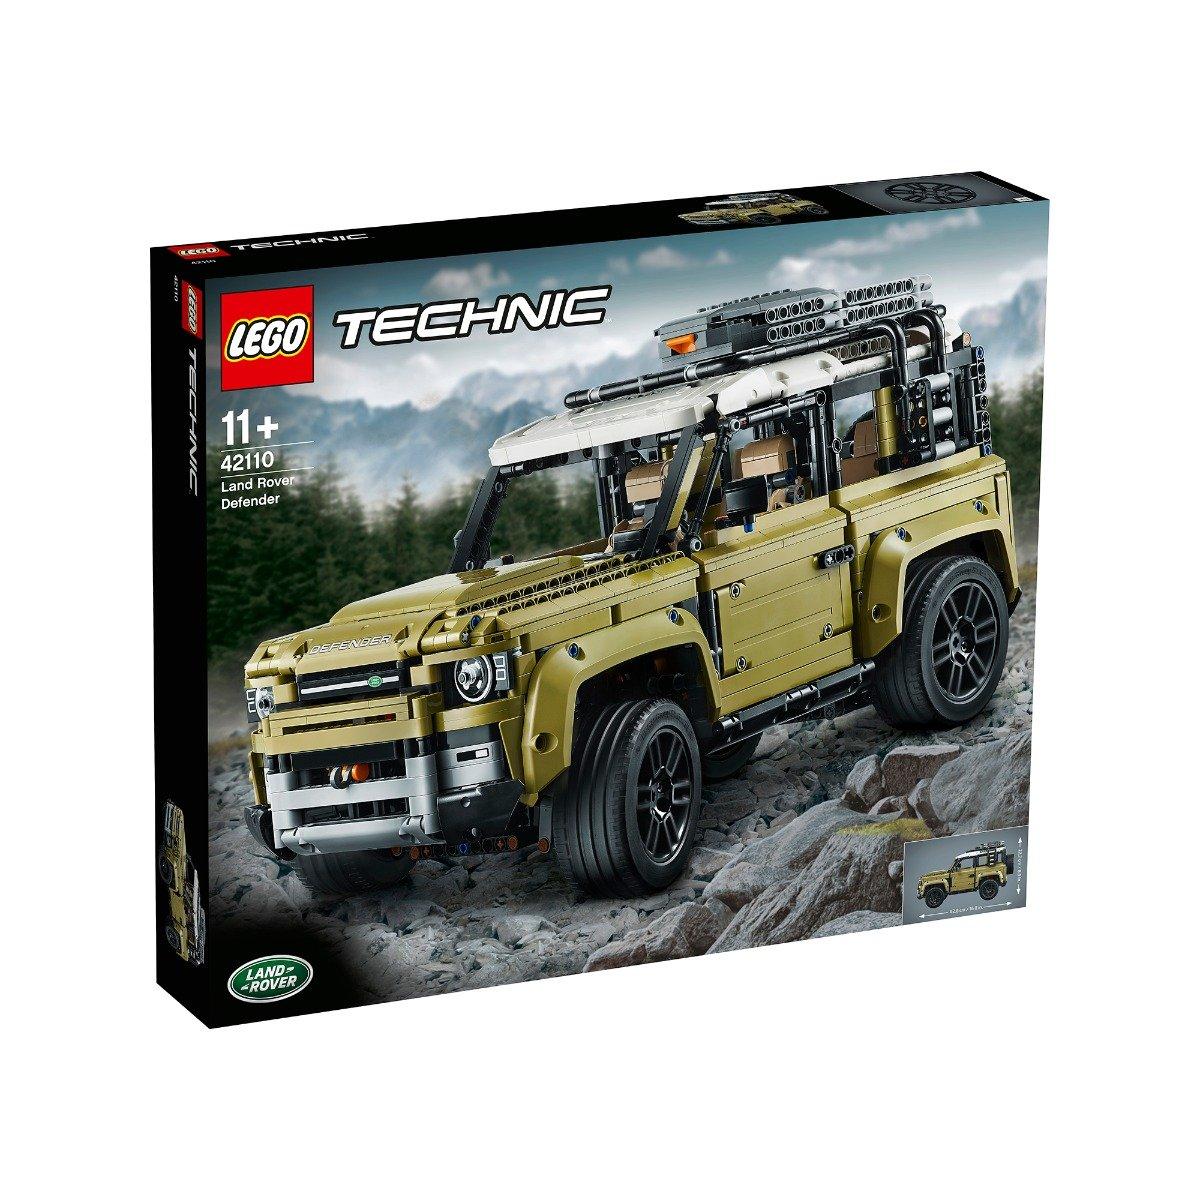 Lego® Technic - Land Rover Defender (42110)